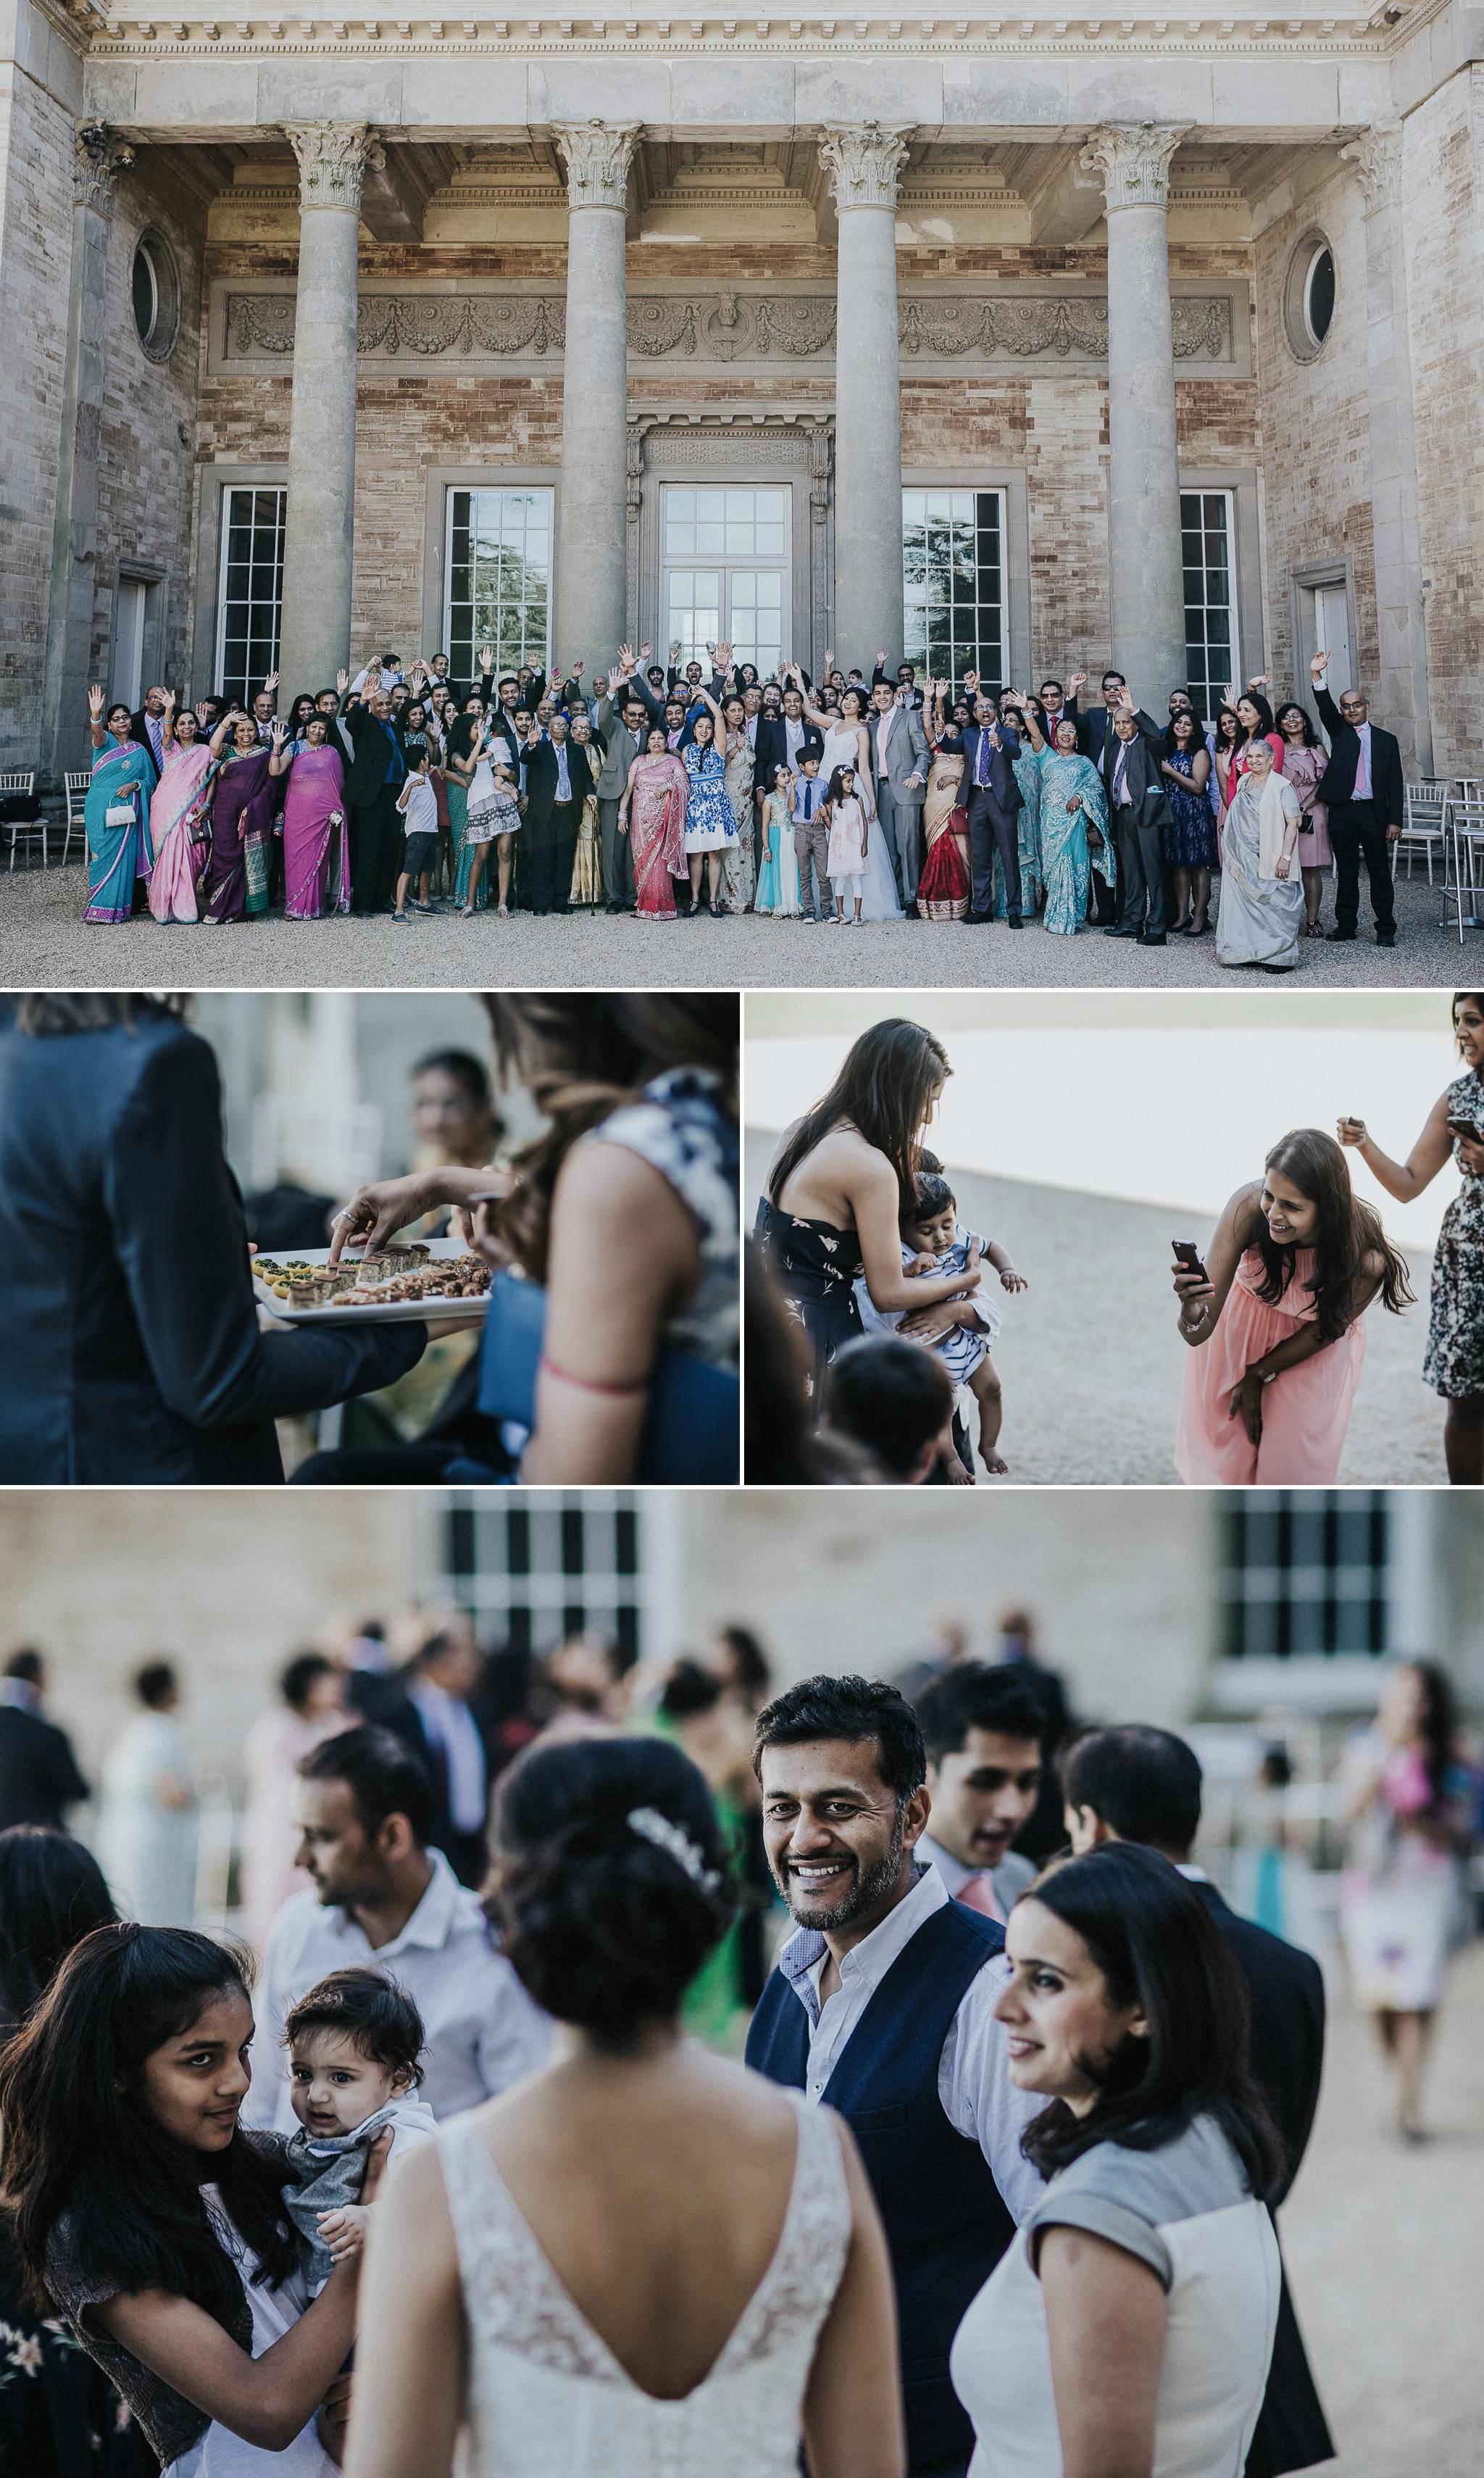 compton-verney-wedding-photos 21.jpg